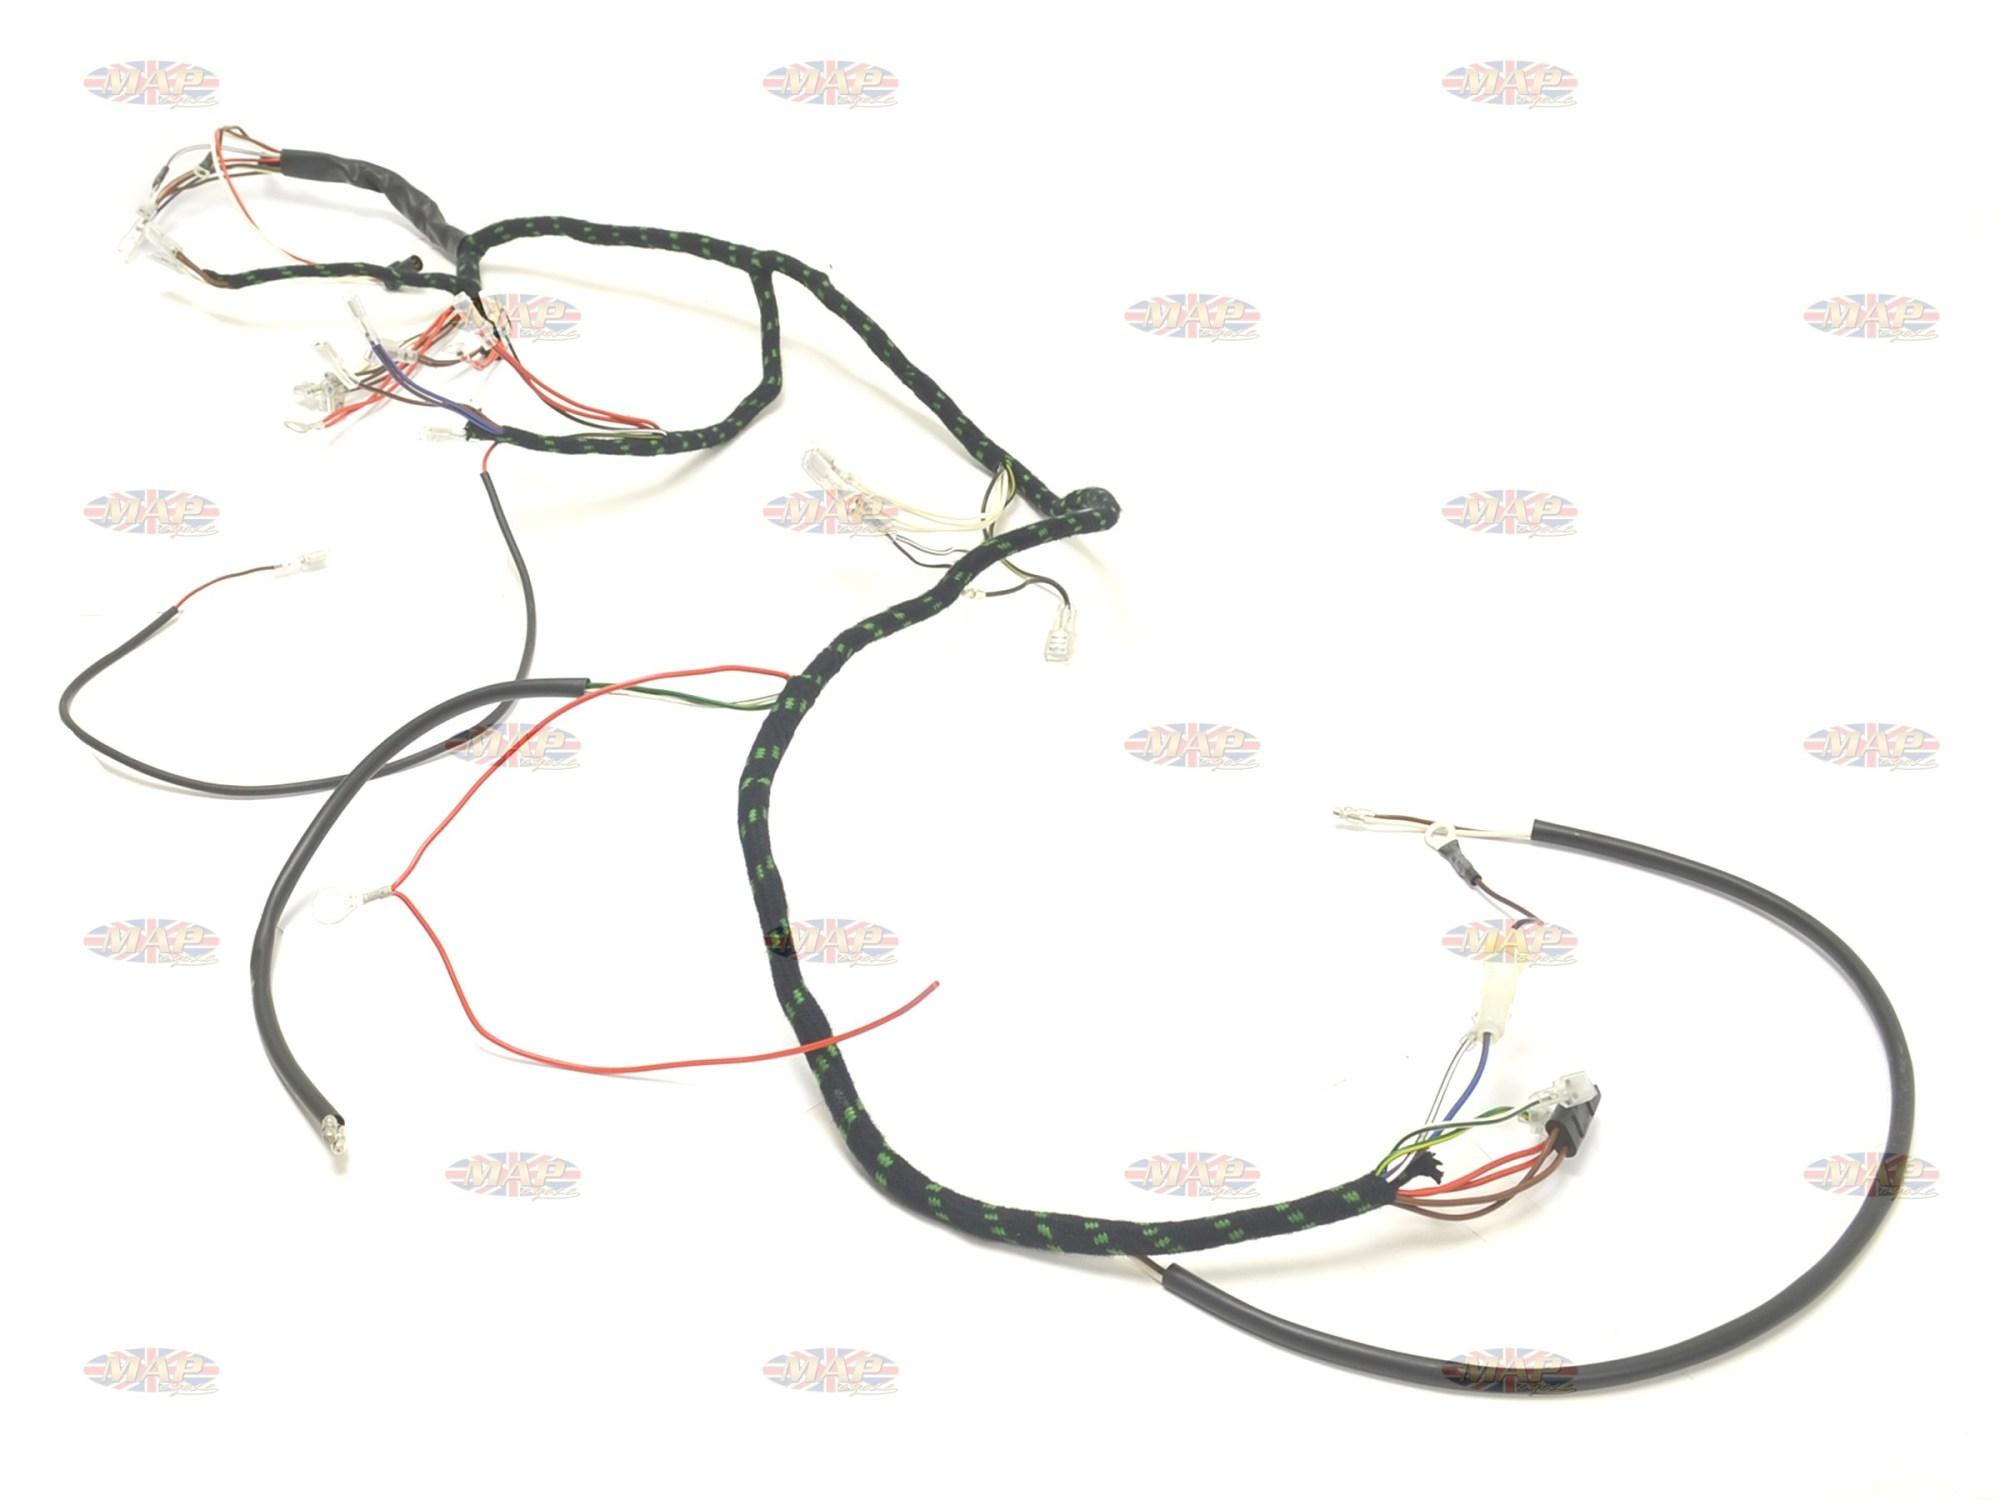 hight resolution of tr250 wiring diagram austin healey wiring diagram wiring austin healey 3000 triumph tr4